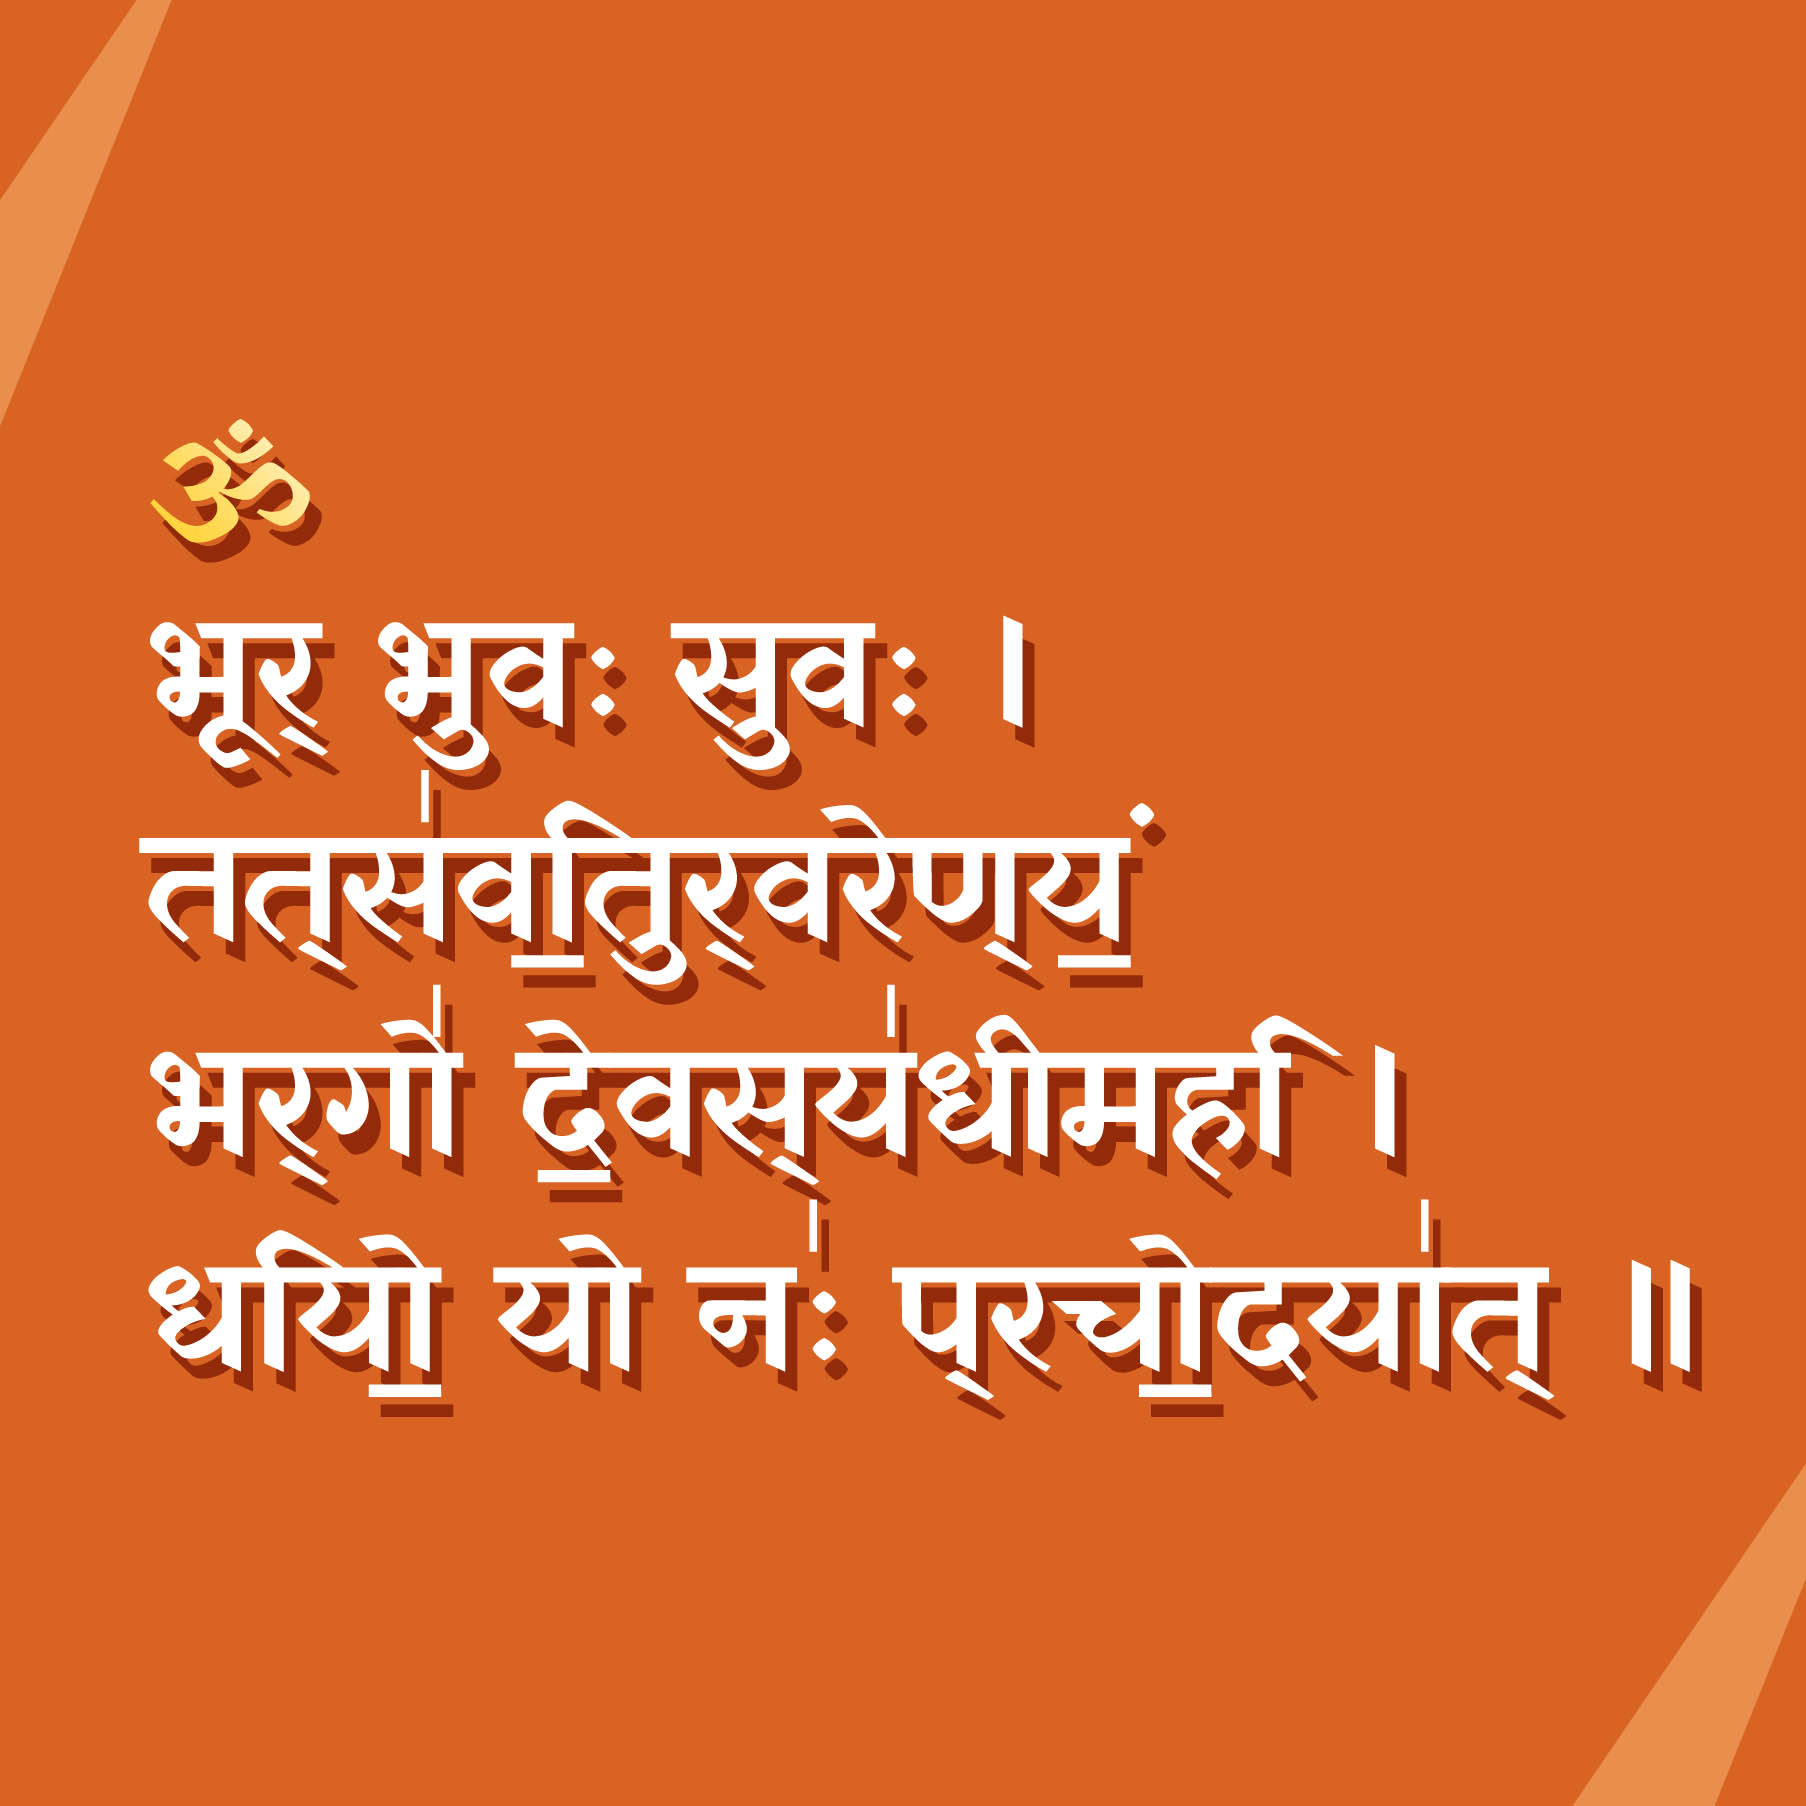 Gayatri Mantra - Wikipedia